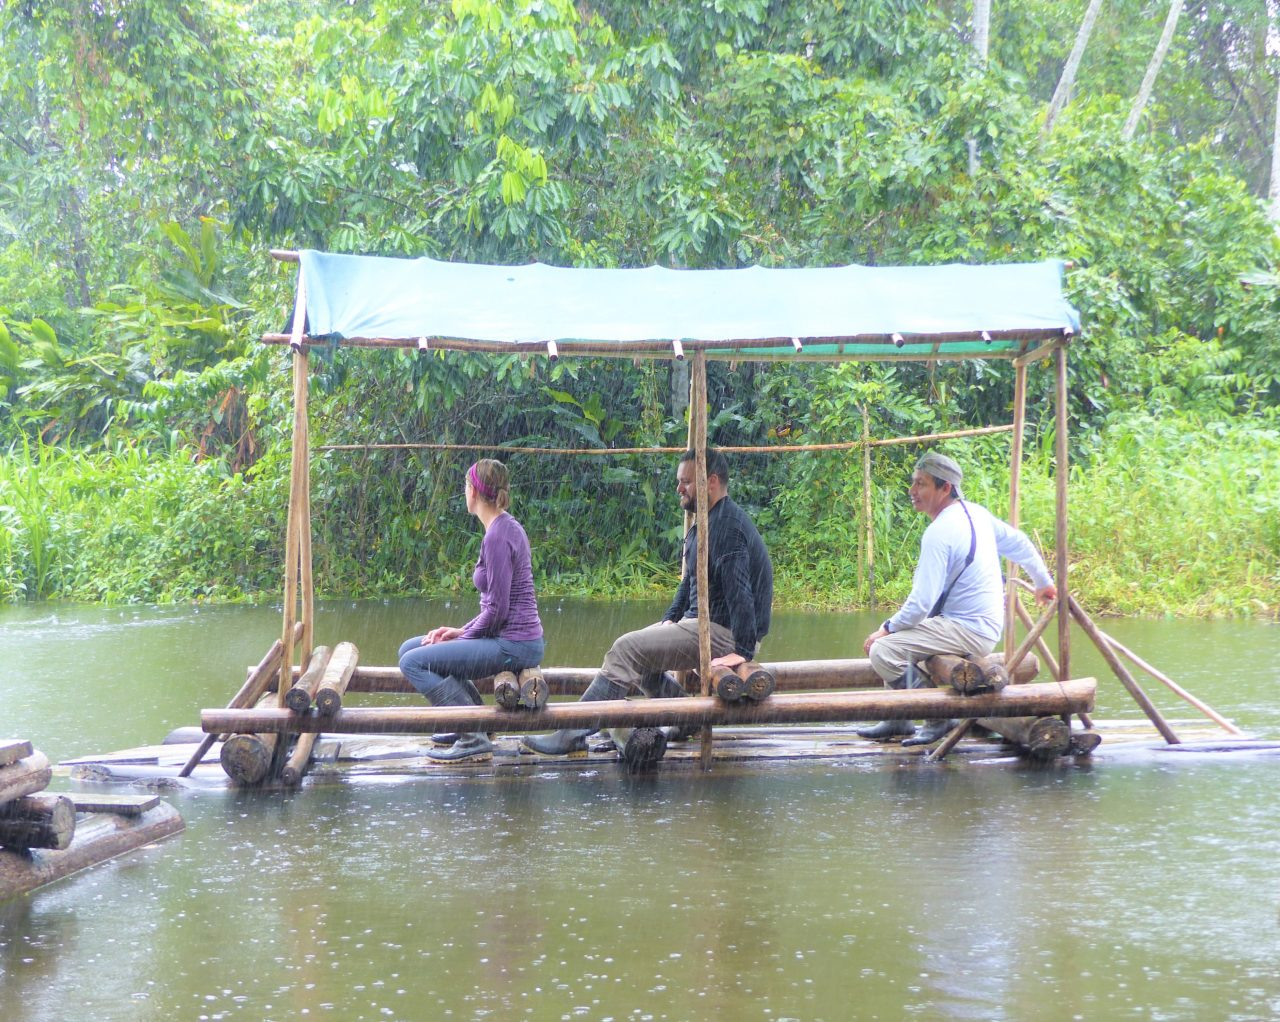 https://wildwatchperu.com/wp-content/uploads/2021/06/amazon-rainforest-peru-2021-1280x1022.jpg